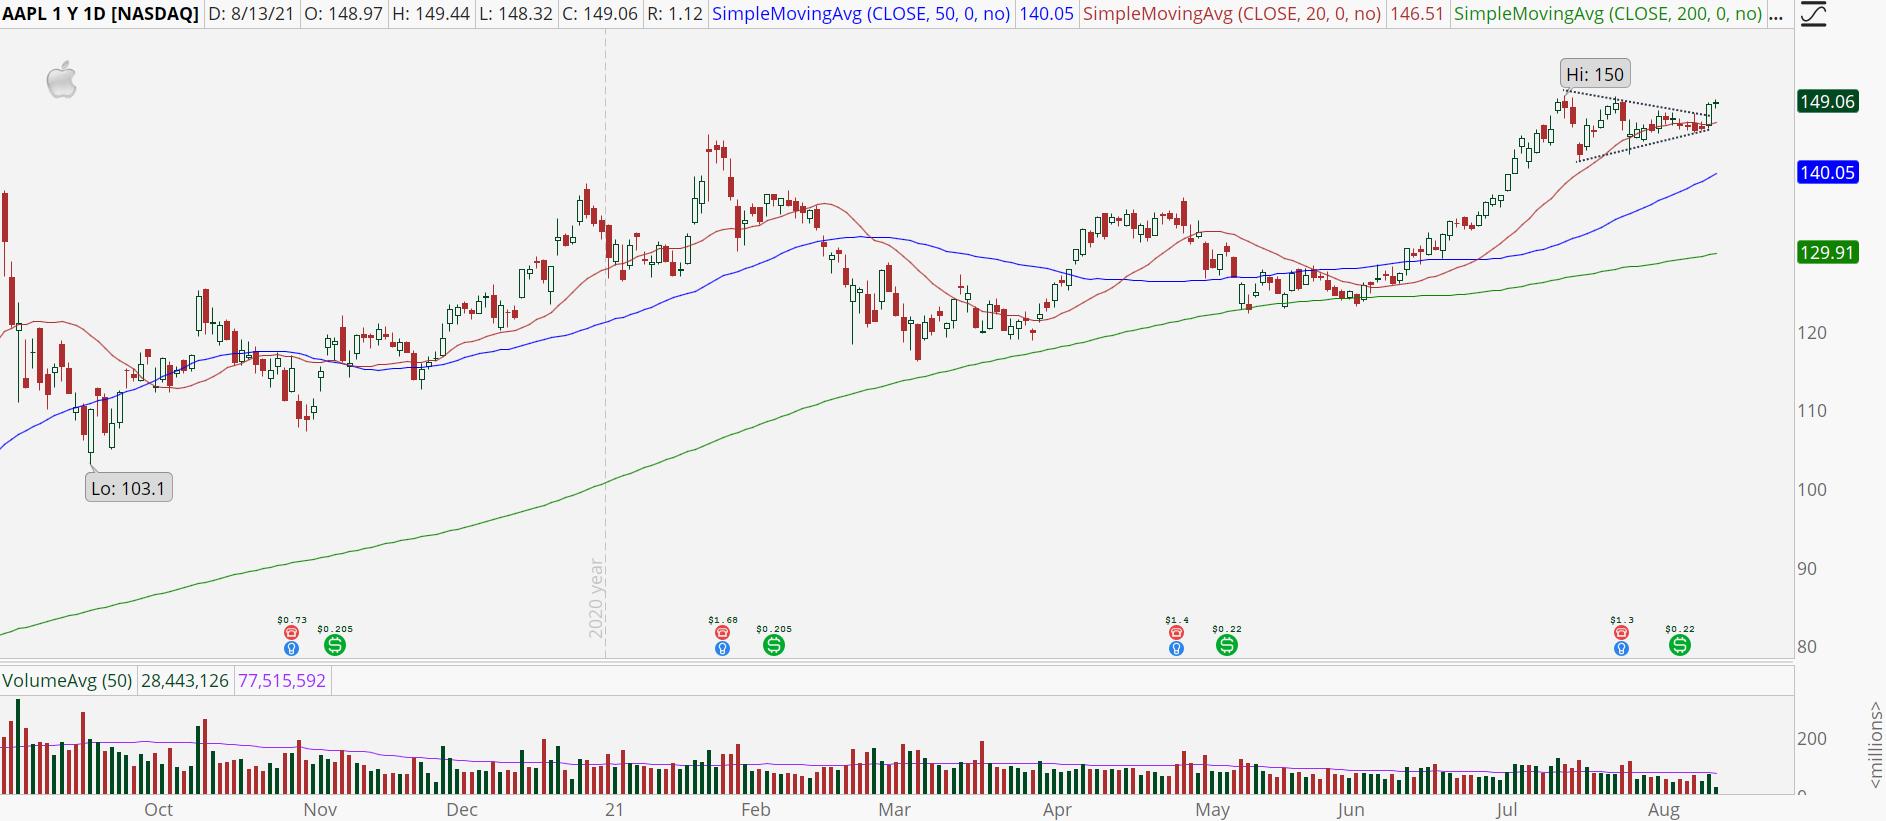 Apple (AAPL) stock chart with bullish breakout